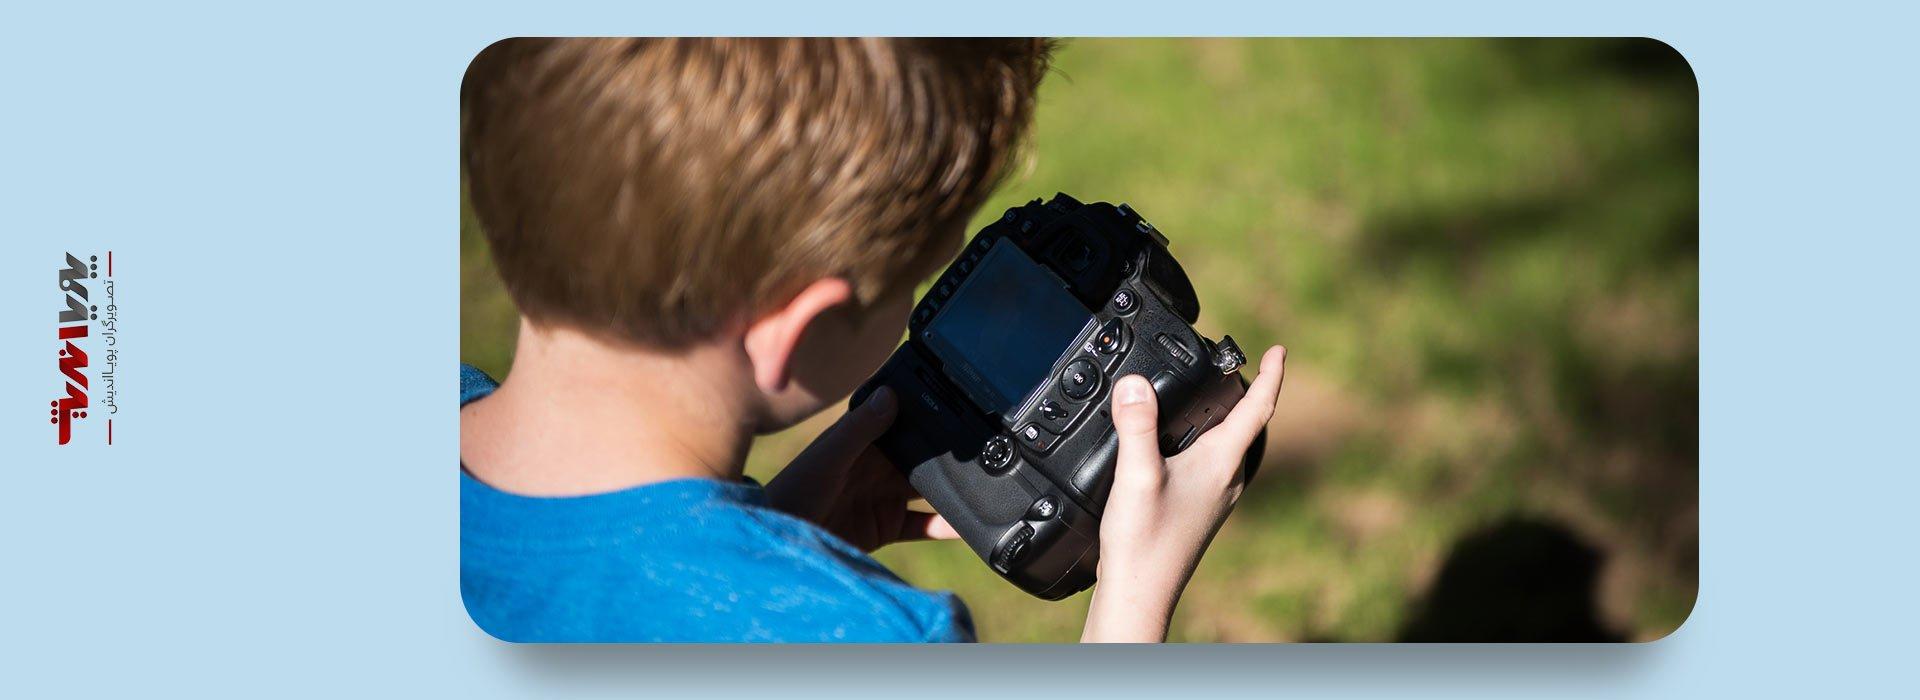 girl photographer 7 - چرا کودکان ما باید عکاسی بیاموزند ؟